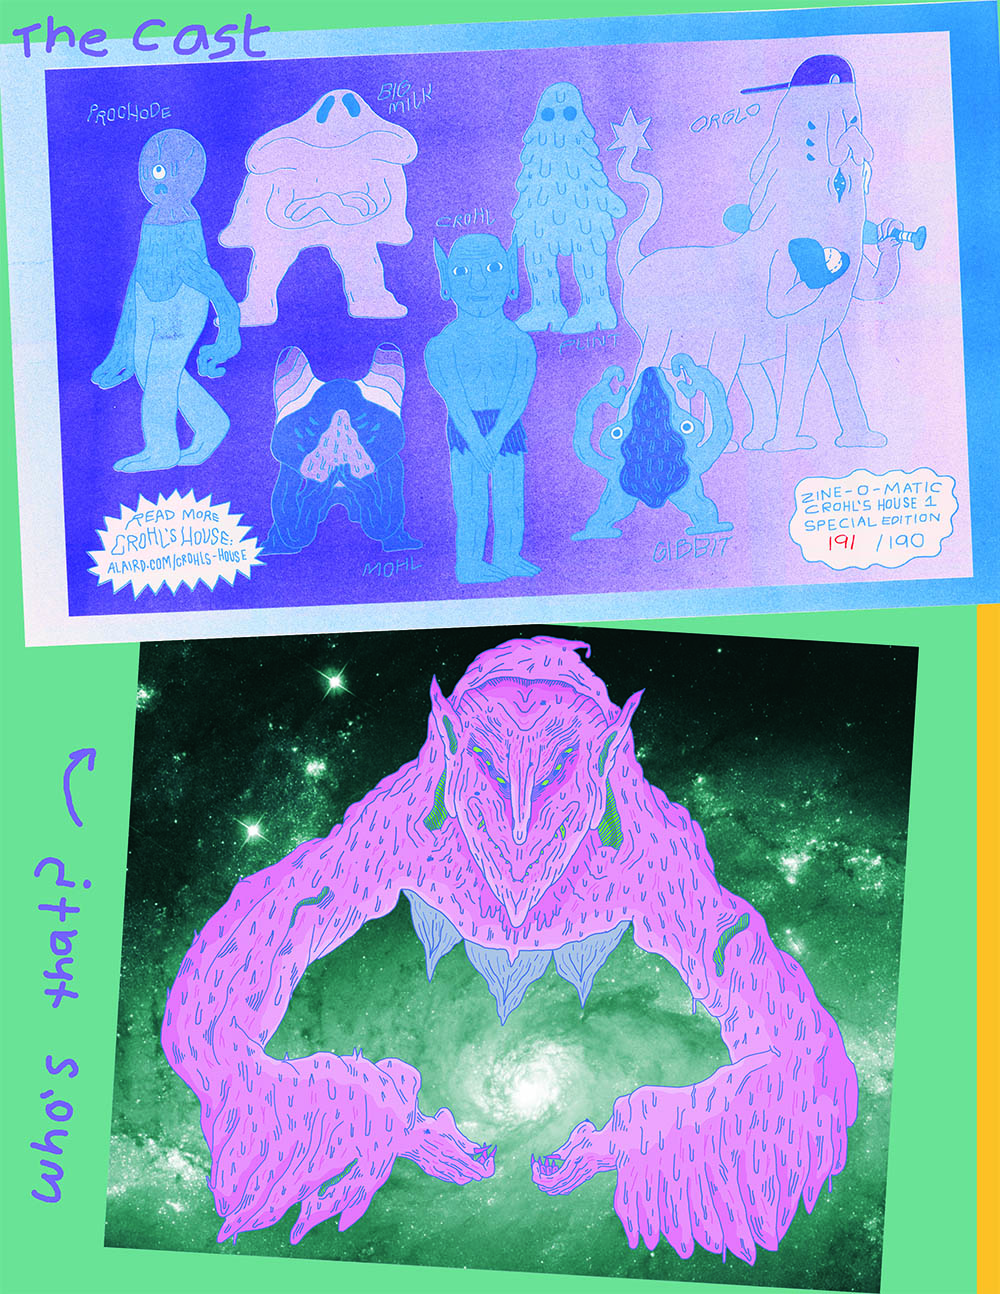 CC CH pdf_0003s_0008_Brightness_Contrast 1.jpg